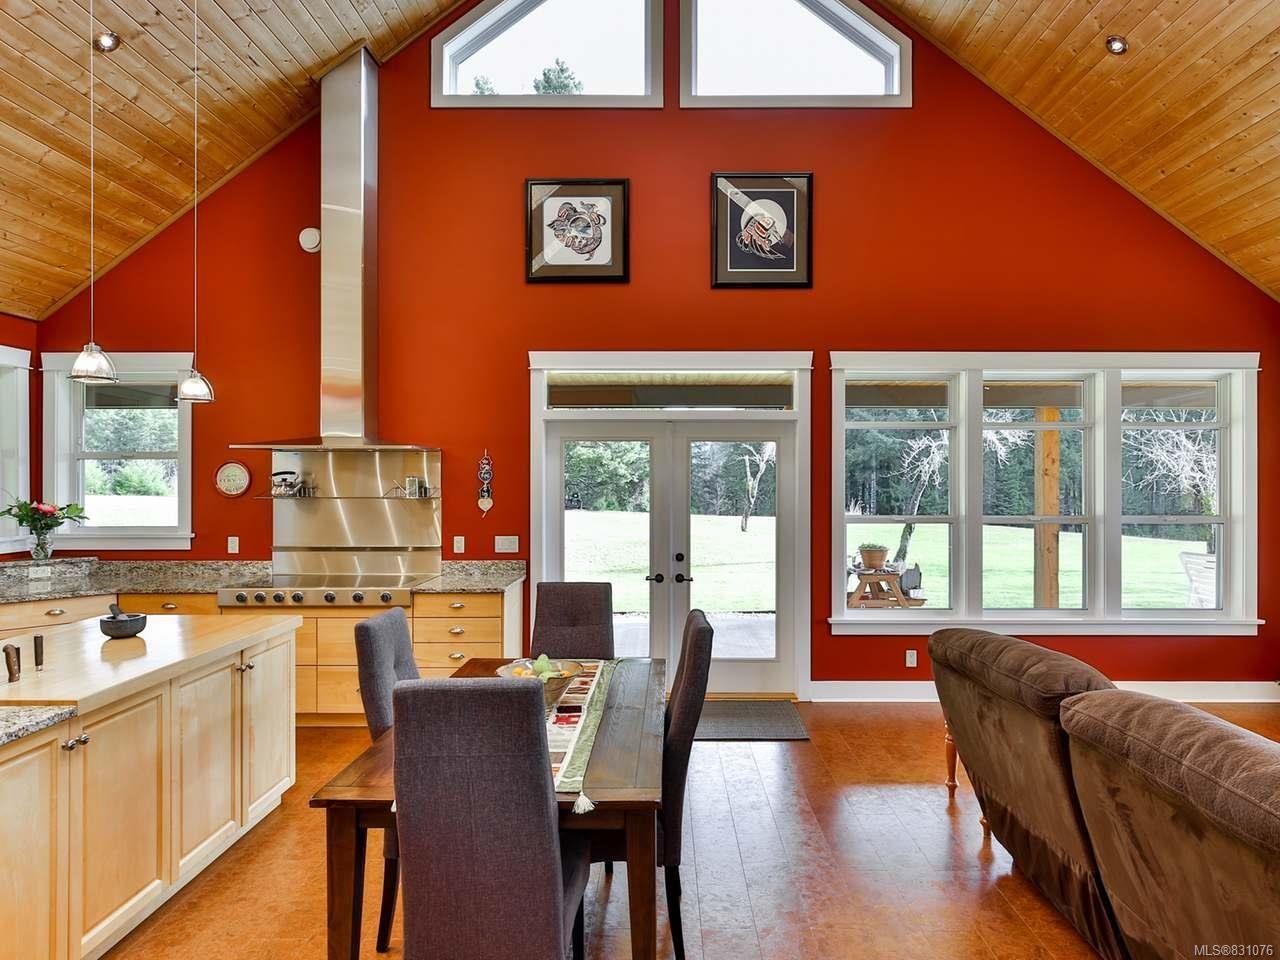 Photo 16: Photos: 6159 Strathcona St in PORT ALBERNI: PA Alberni Valley House for sale (Port Alberni)  : MLS®# 831076